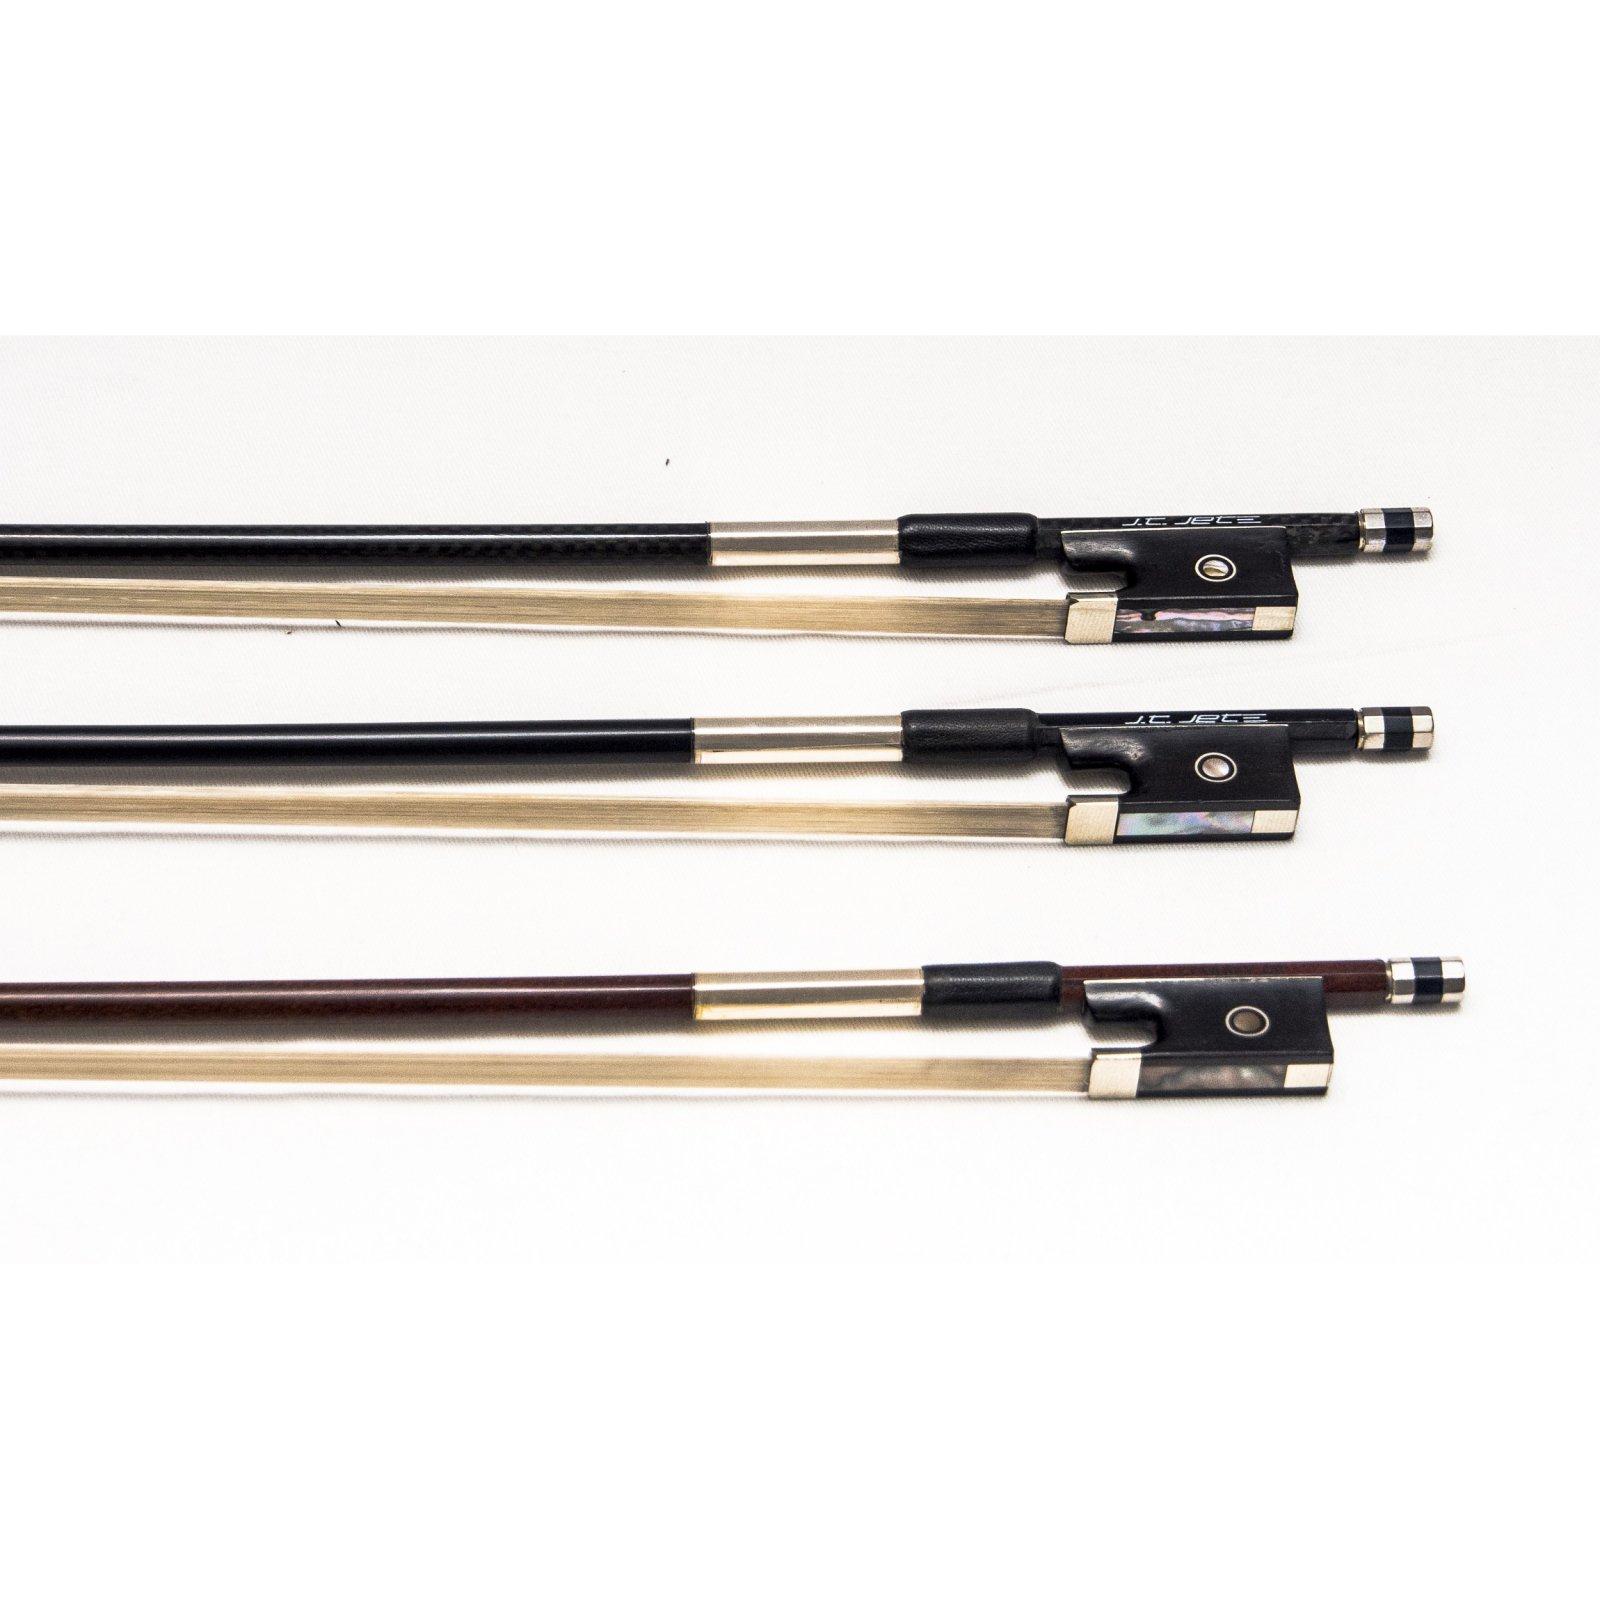 J.T. Jet Deluxe Carbon Fiber Violin Bow, 4/4 (Special Order)